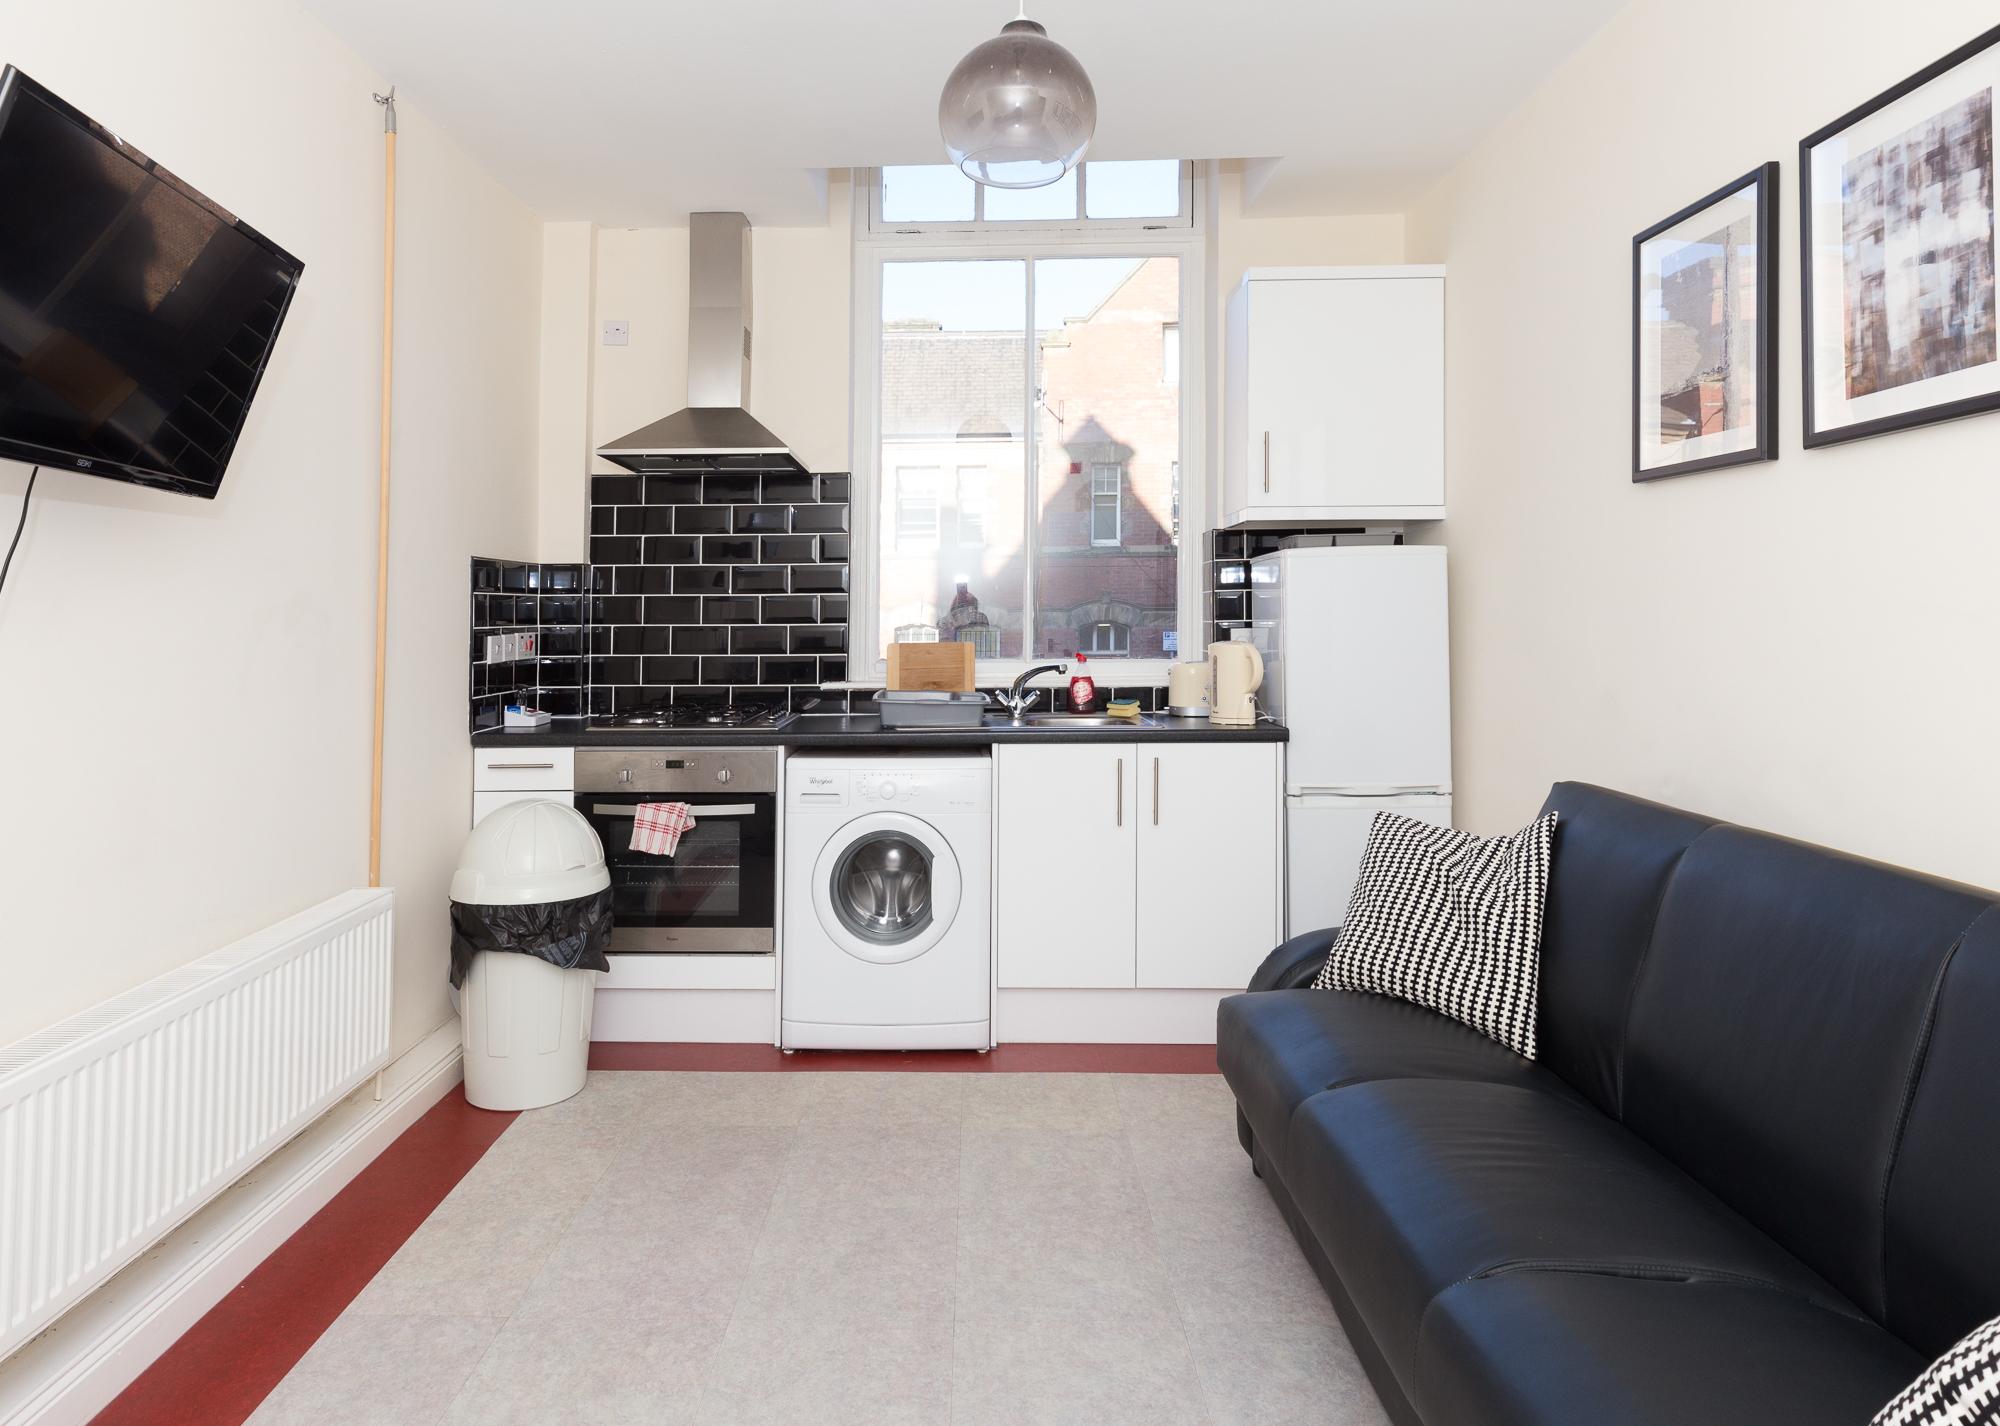 Kitchen facilities at Sunderland Road Apartments - Citybase Apartments